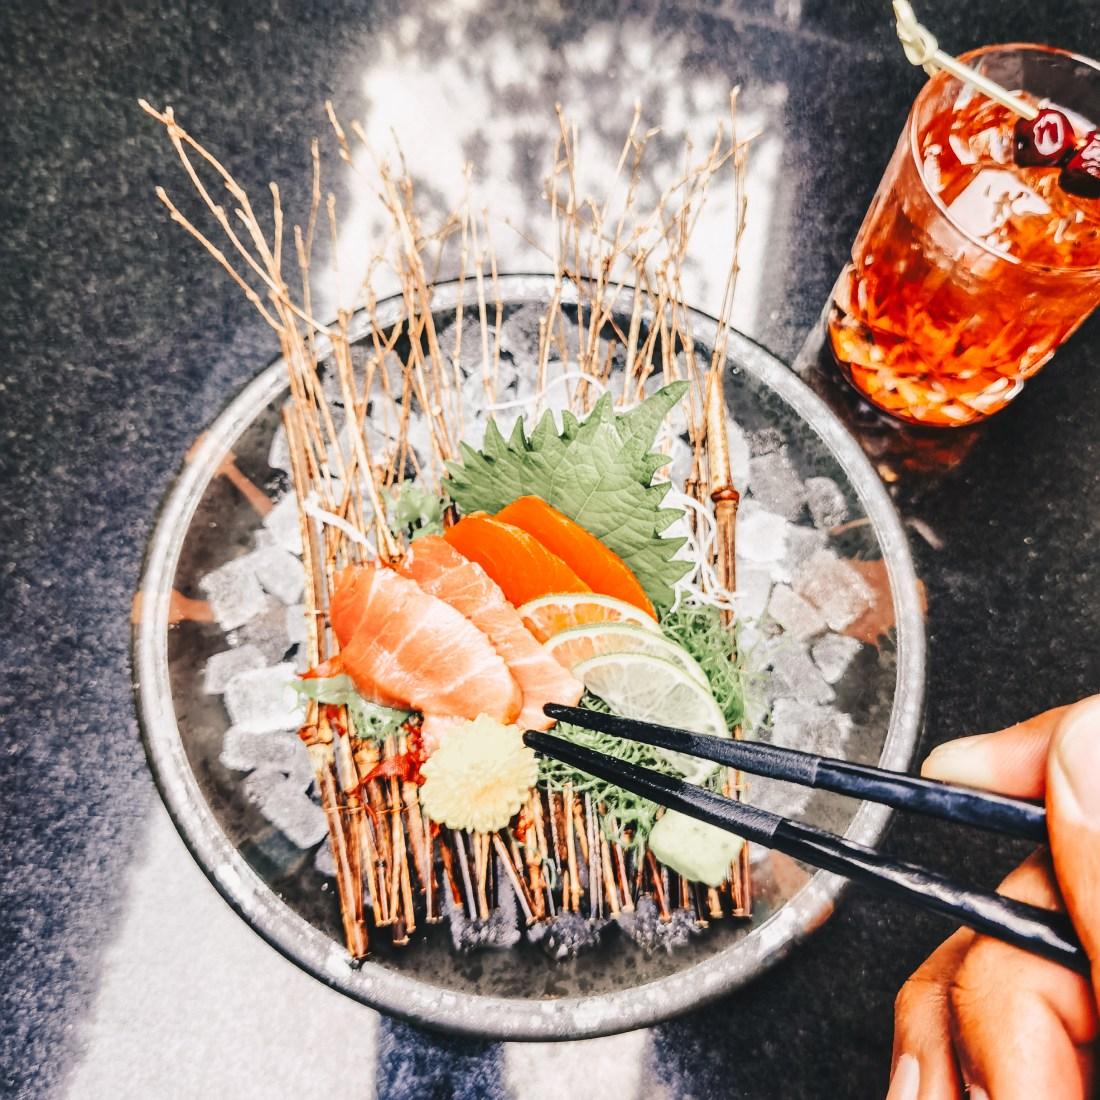 Minami Yaletown Vancouver - Shokai Menu - Chef's Tasting Menu